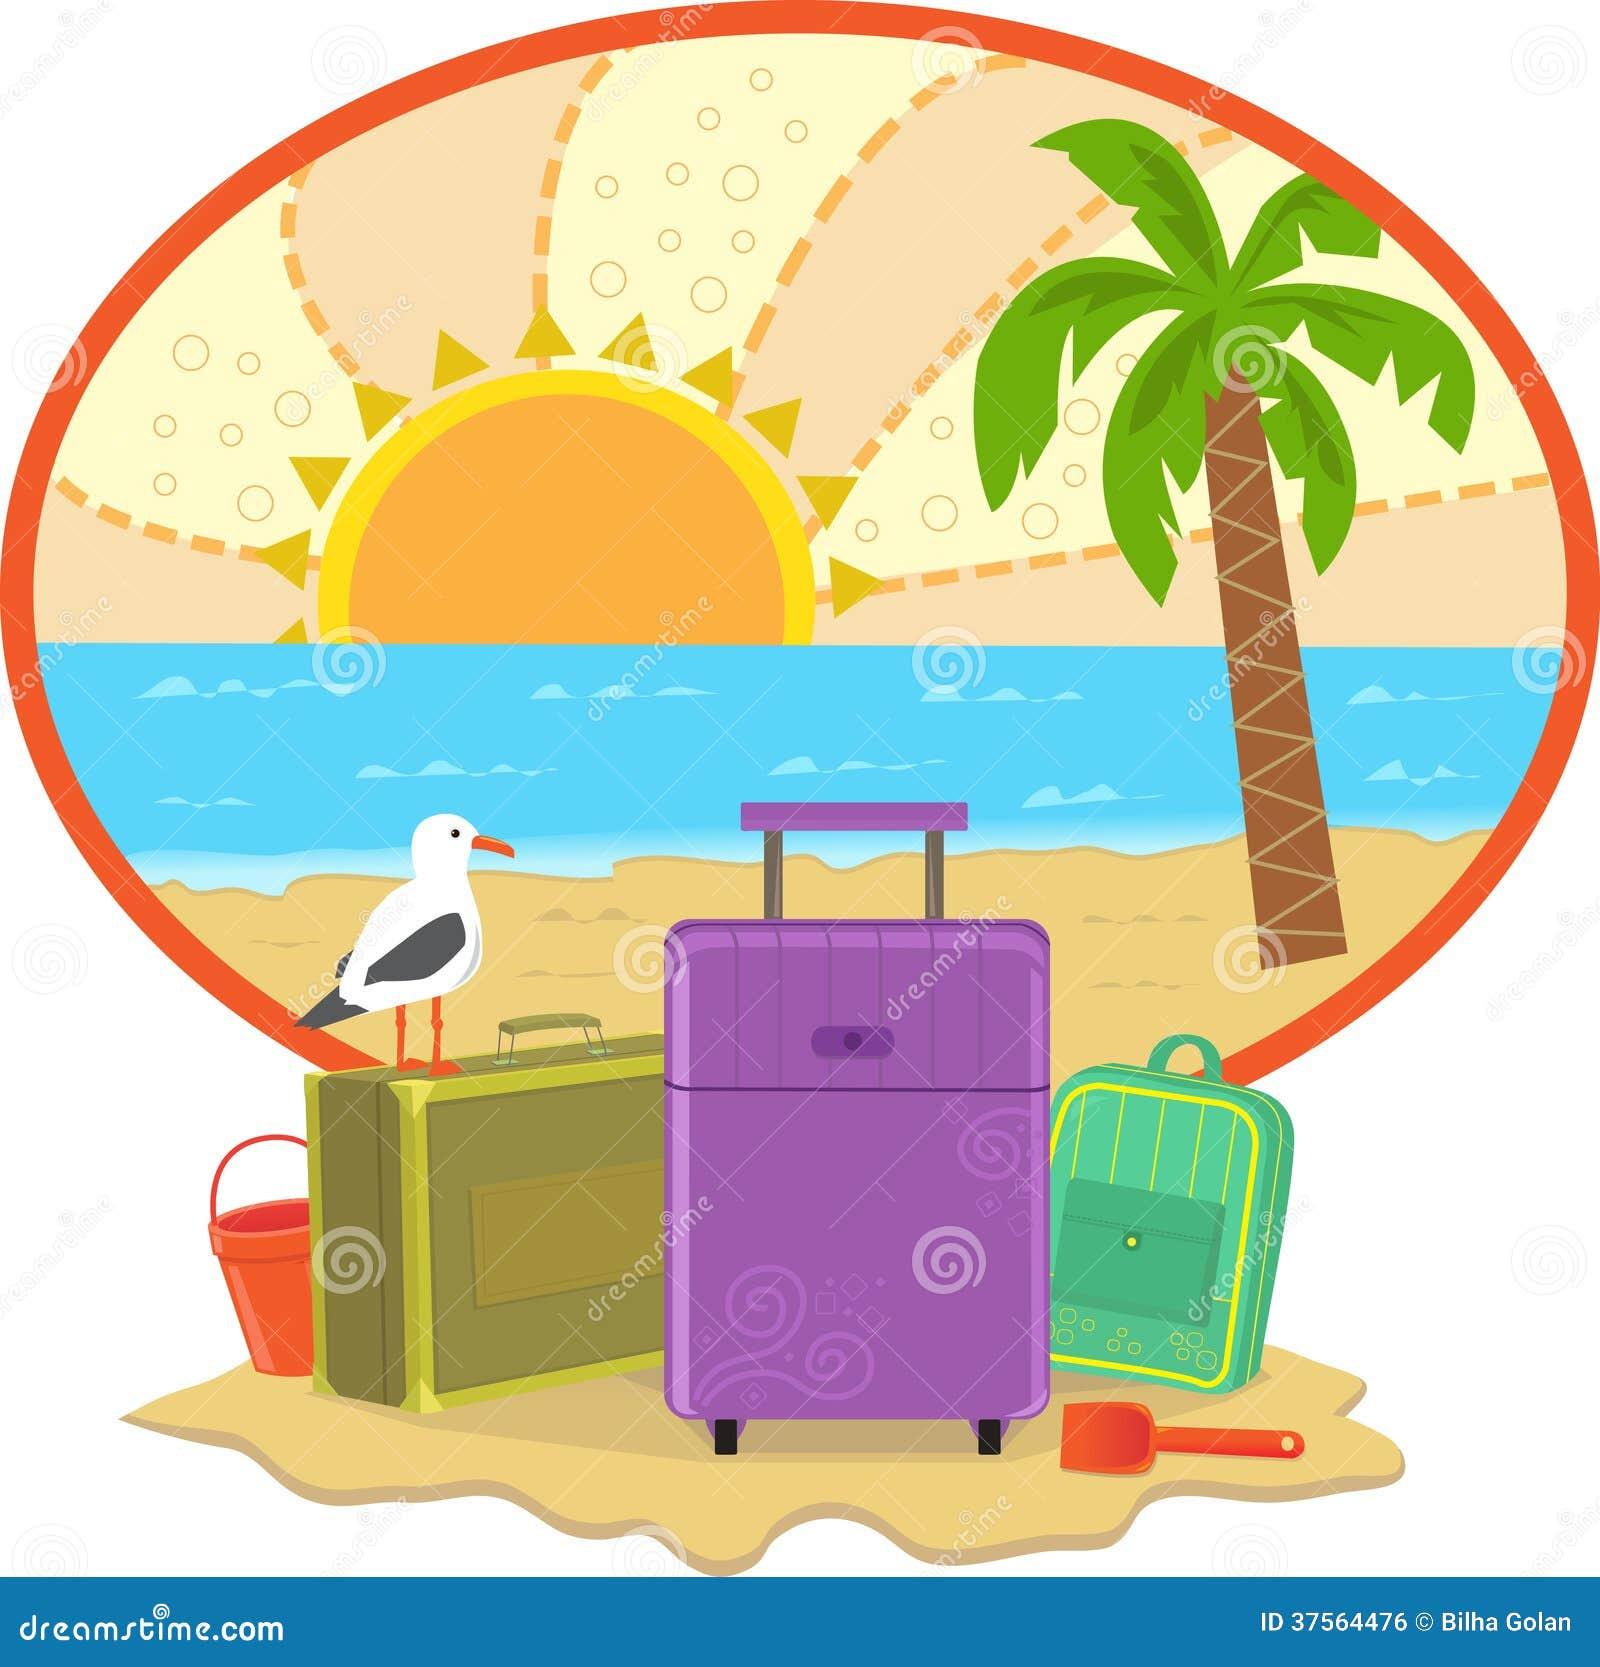 Vacation Icon Royalty Free Stock Image - Image: 37564476